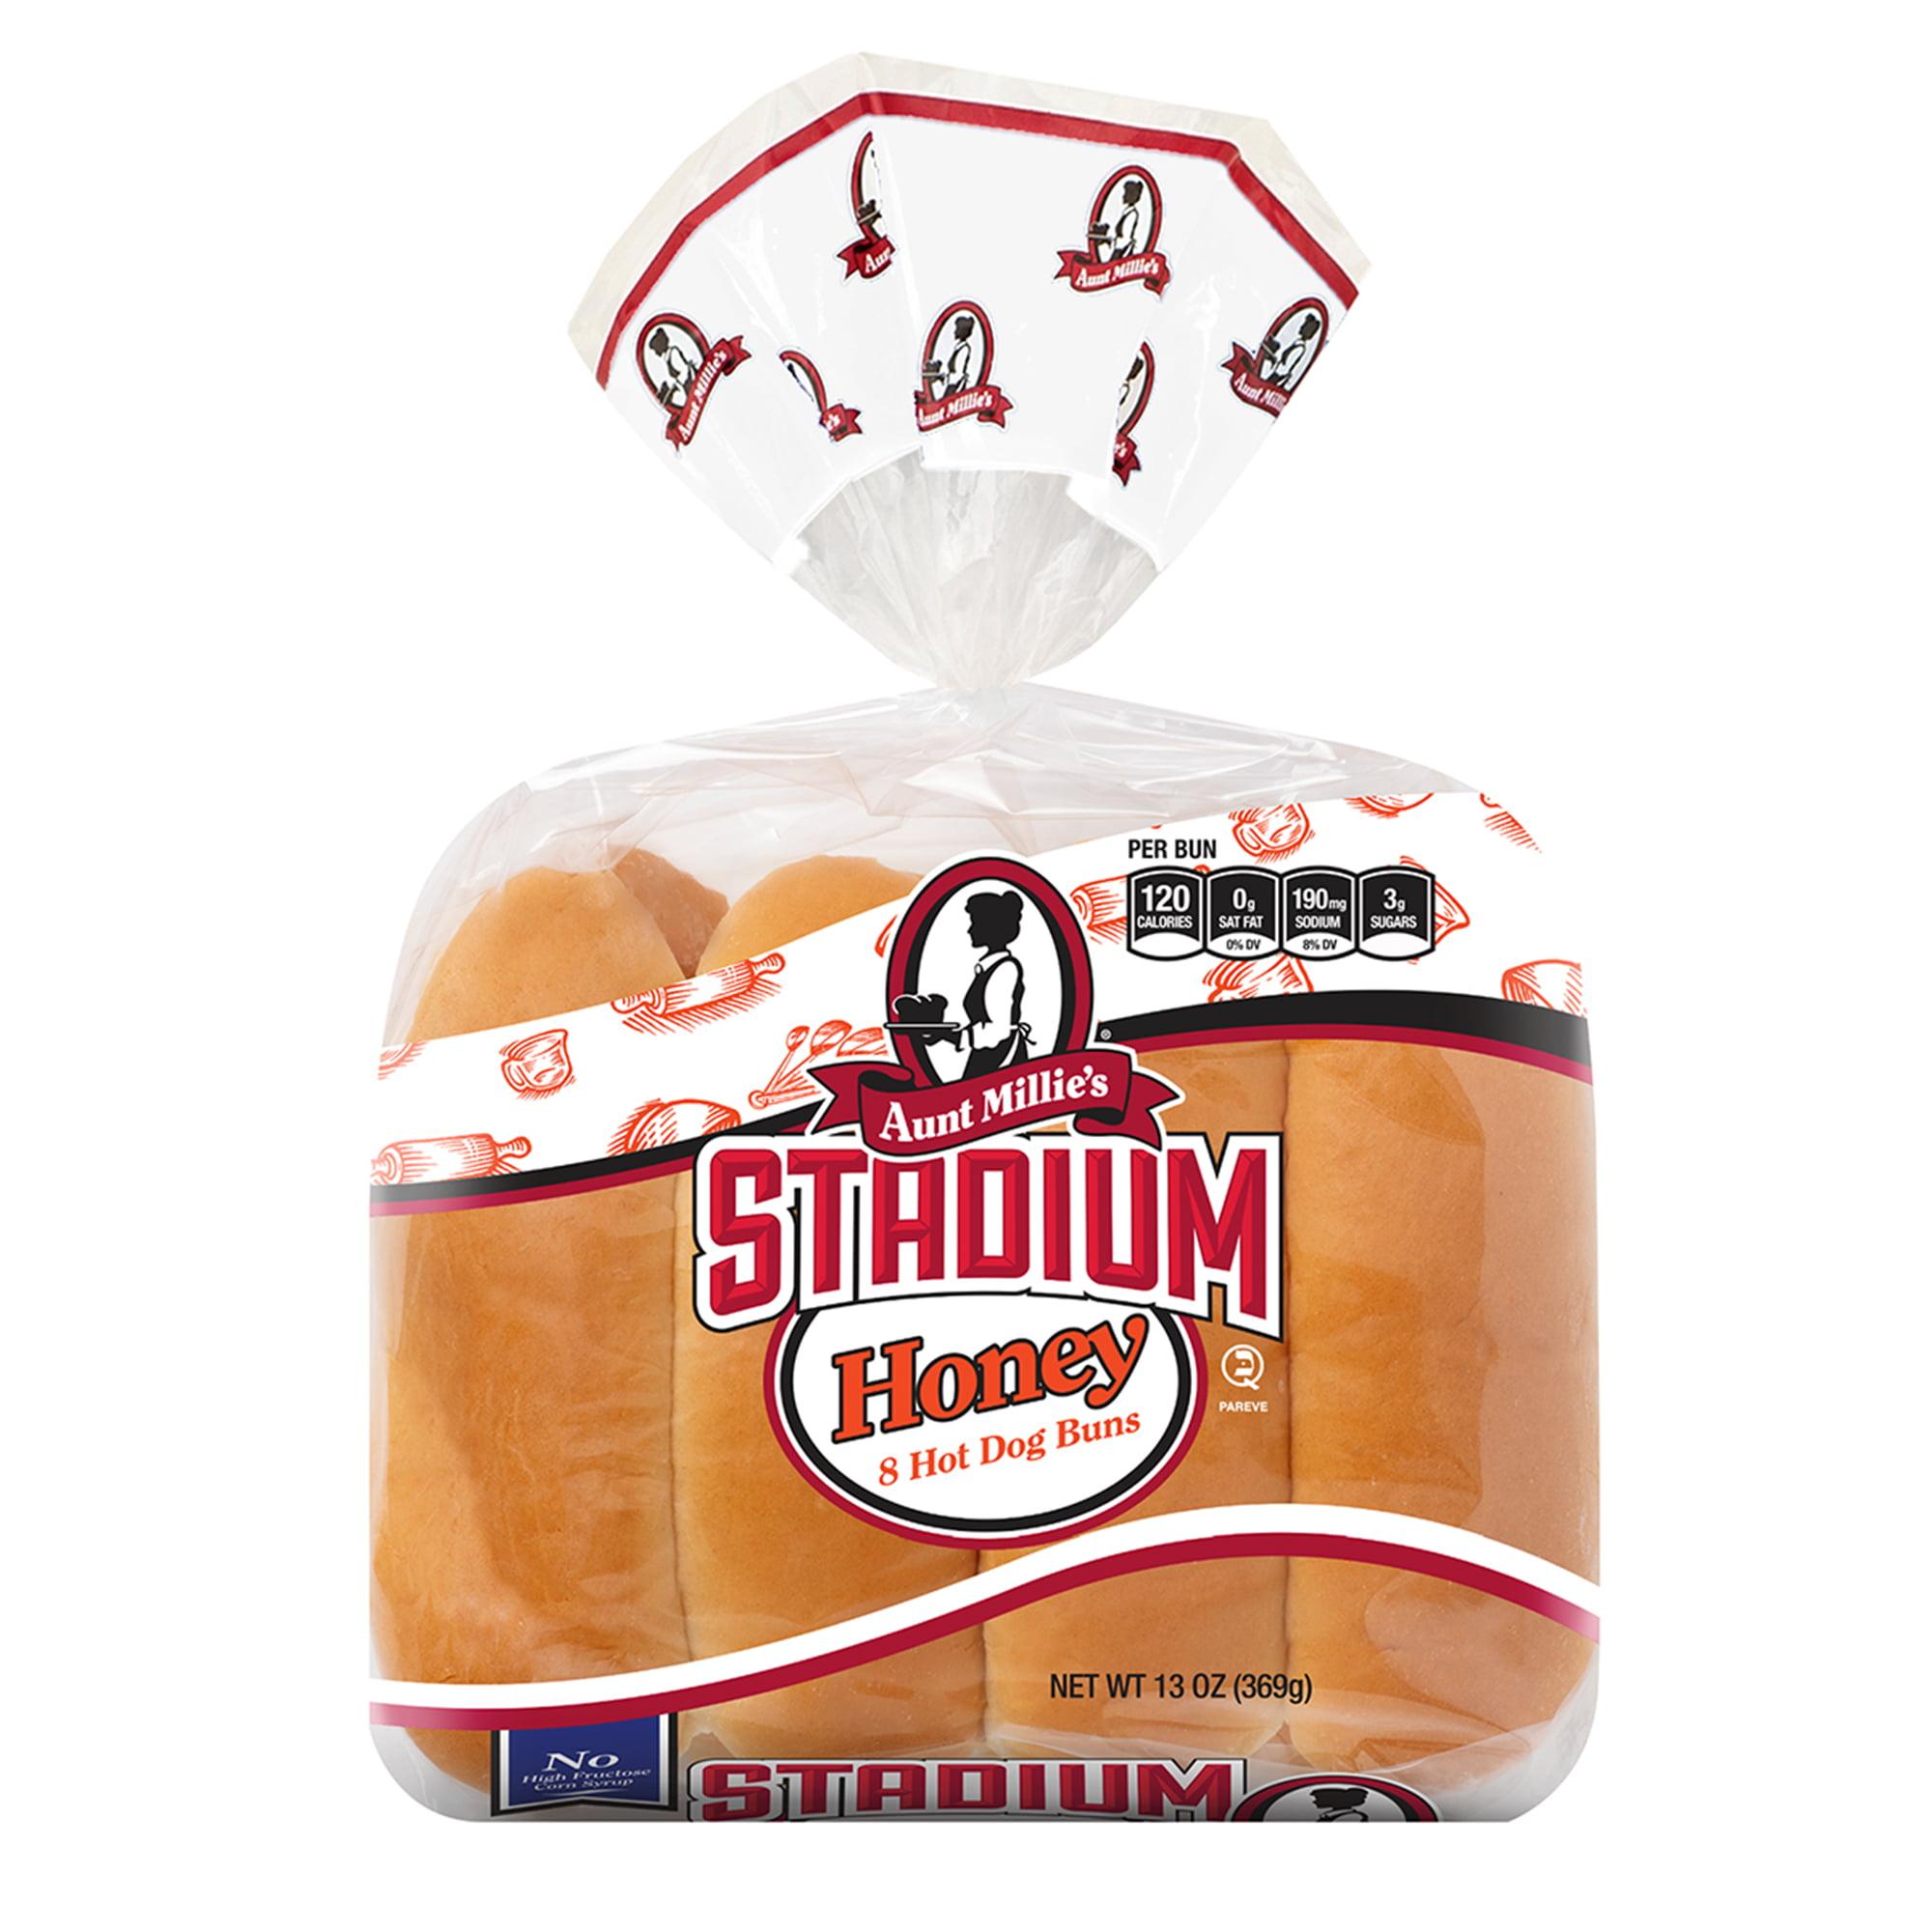 Sunbeam Hot Dog Buns 12 ct Bag - Walmart.com